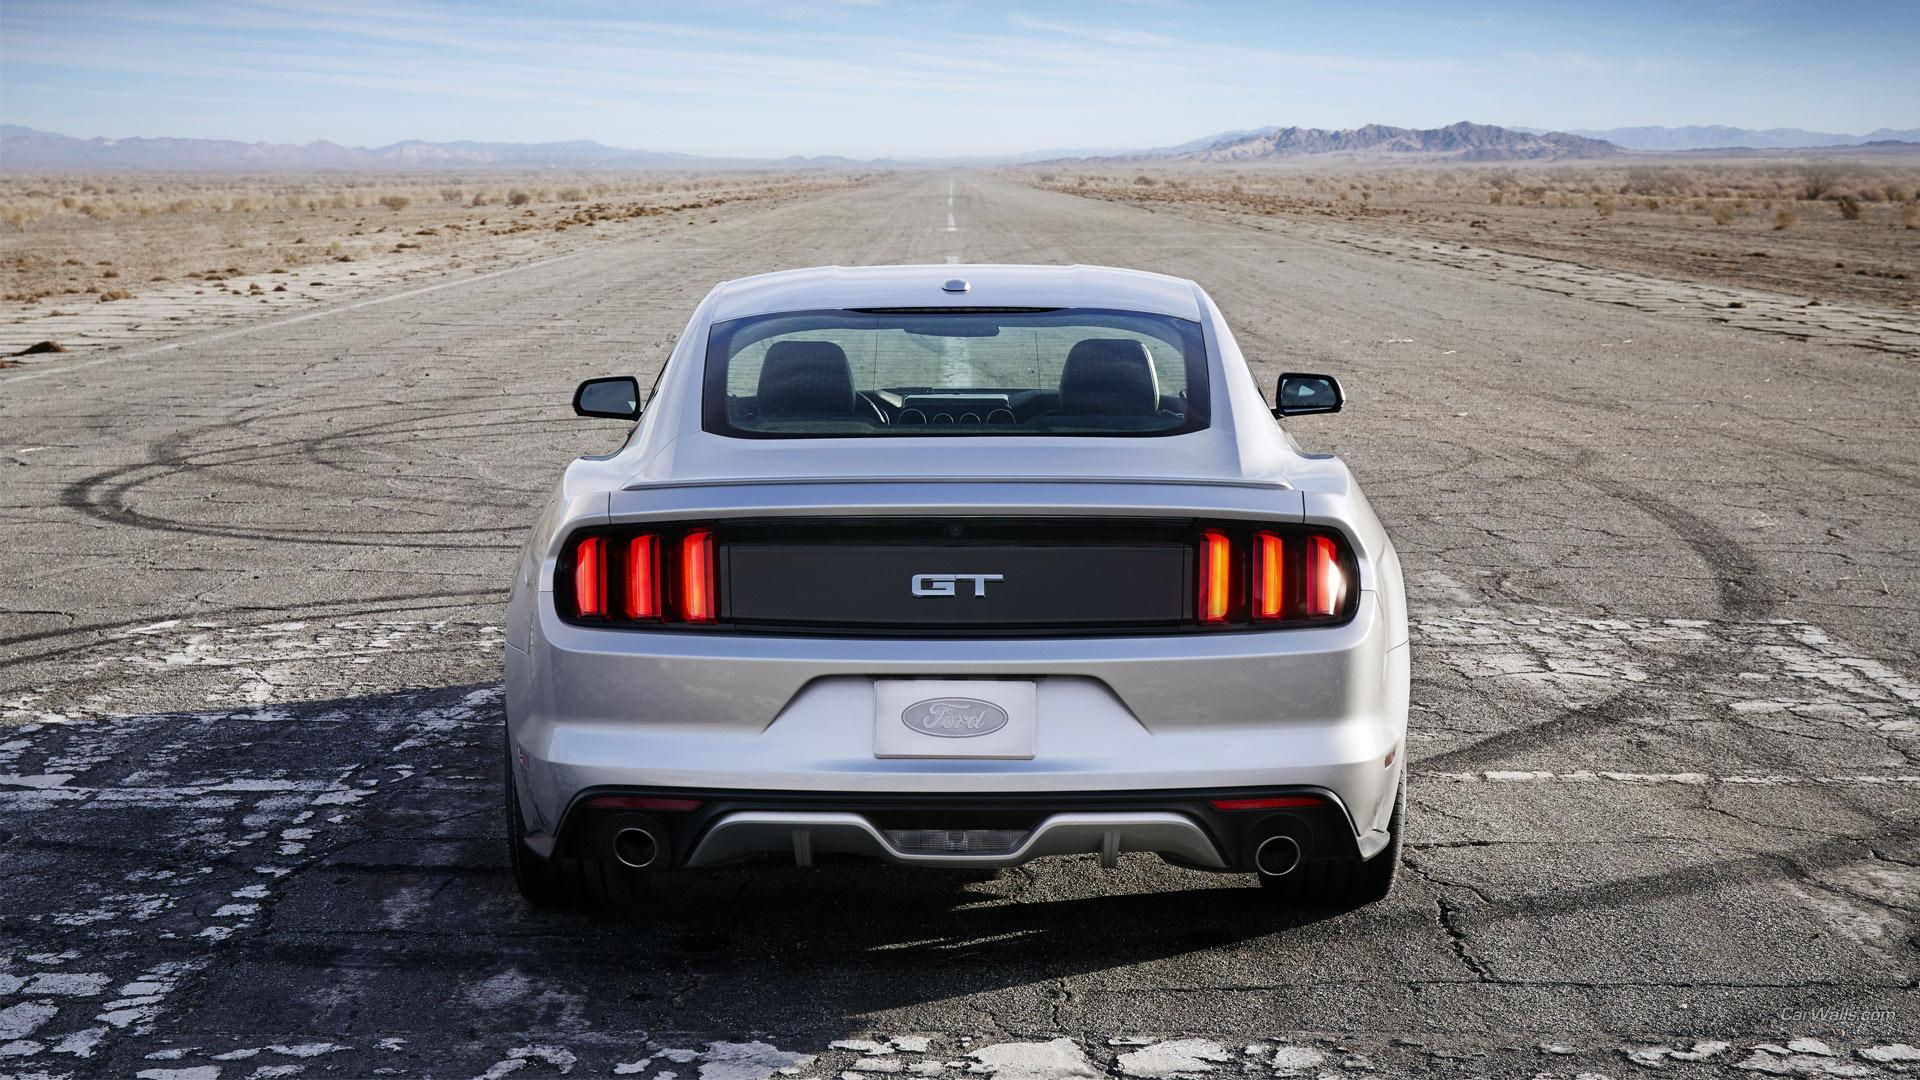 2015 Ford Mustang GT Computer Wallpapers Desktop Backgrounds 1920x1080